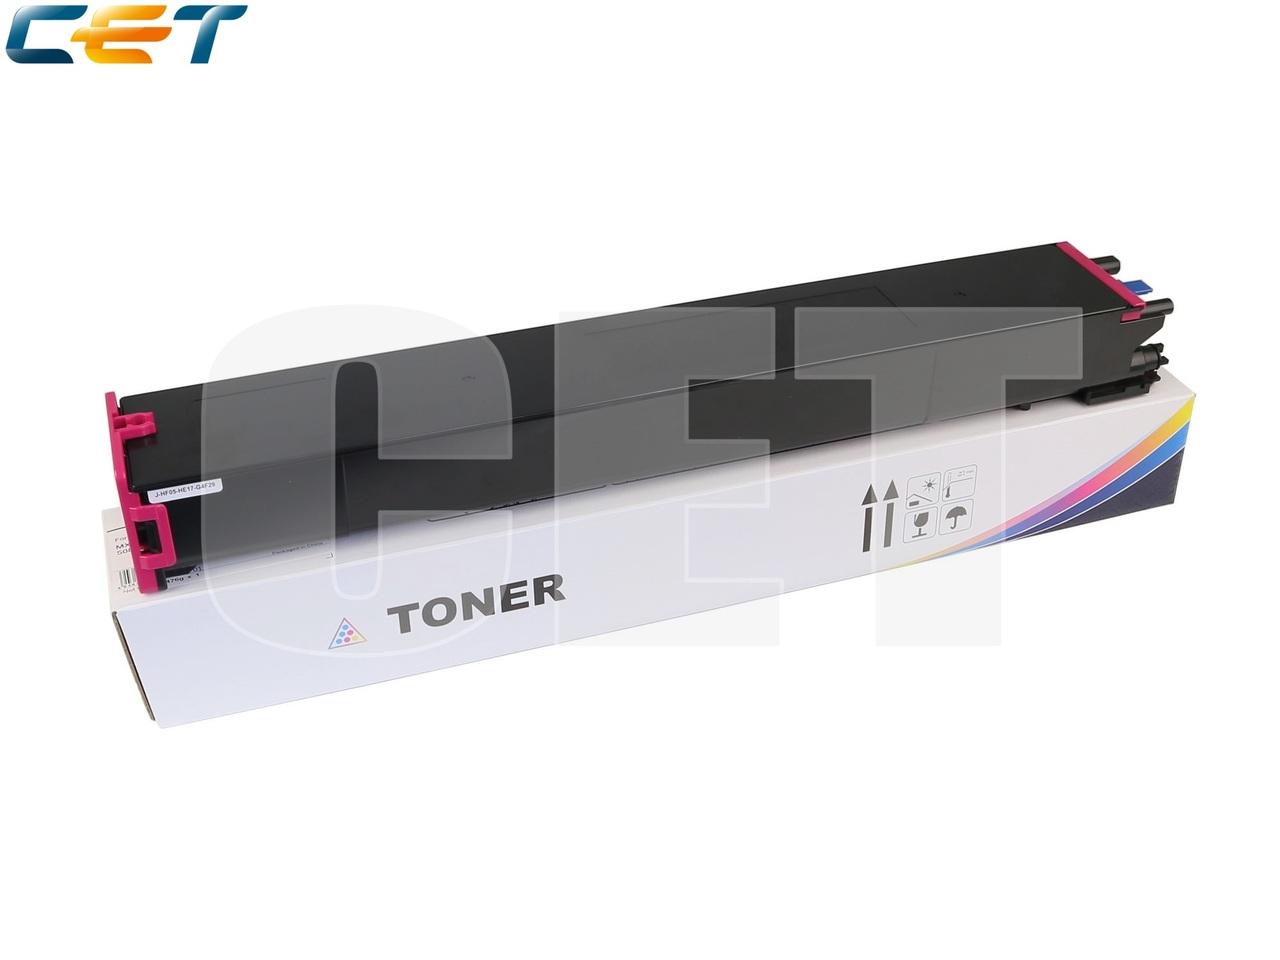 Тонер-картридж MX-60GTMA для SHARPMX-3050N/4050N/4070N/5070N (CET) Magenta, 476г, 24000стр., CET141244